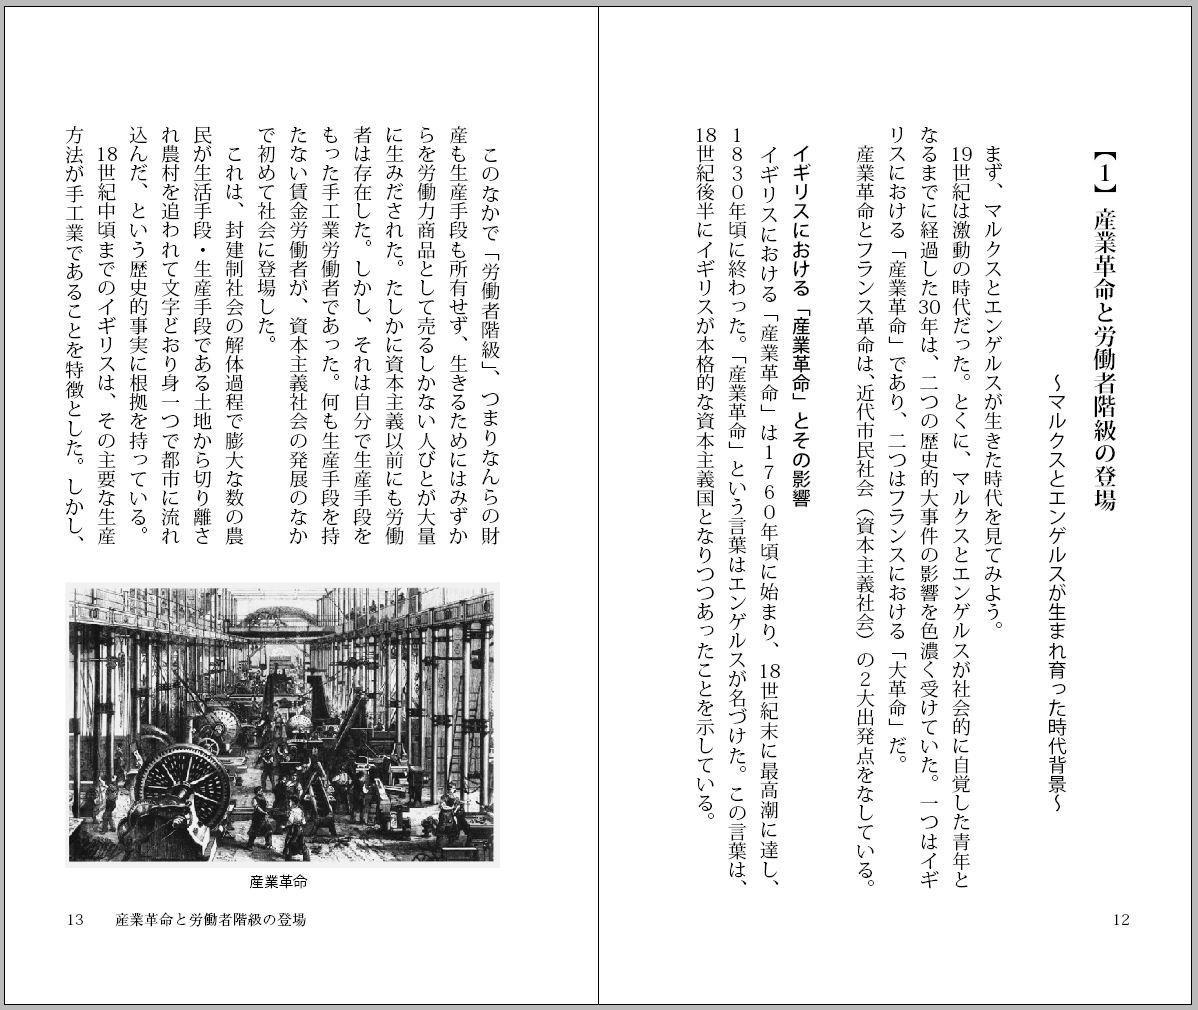 http://www.zenshin.org/zh/publication/20171220b.jpg